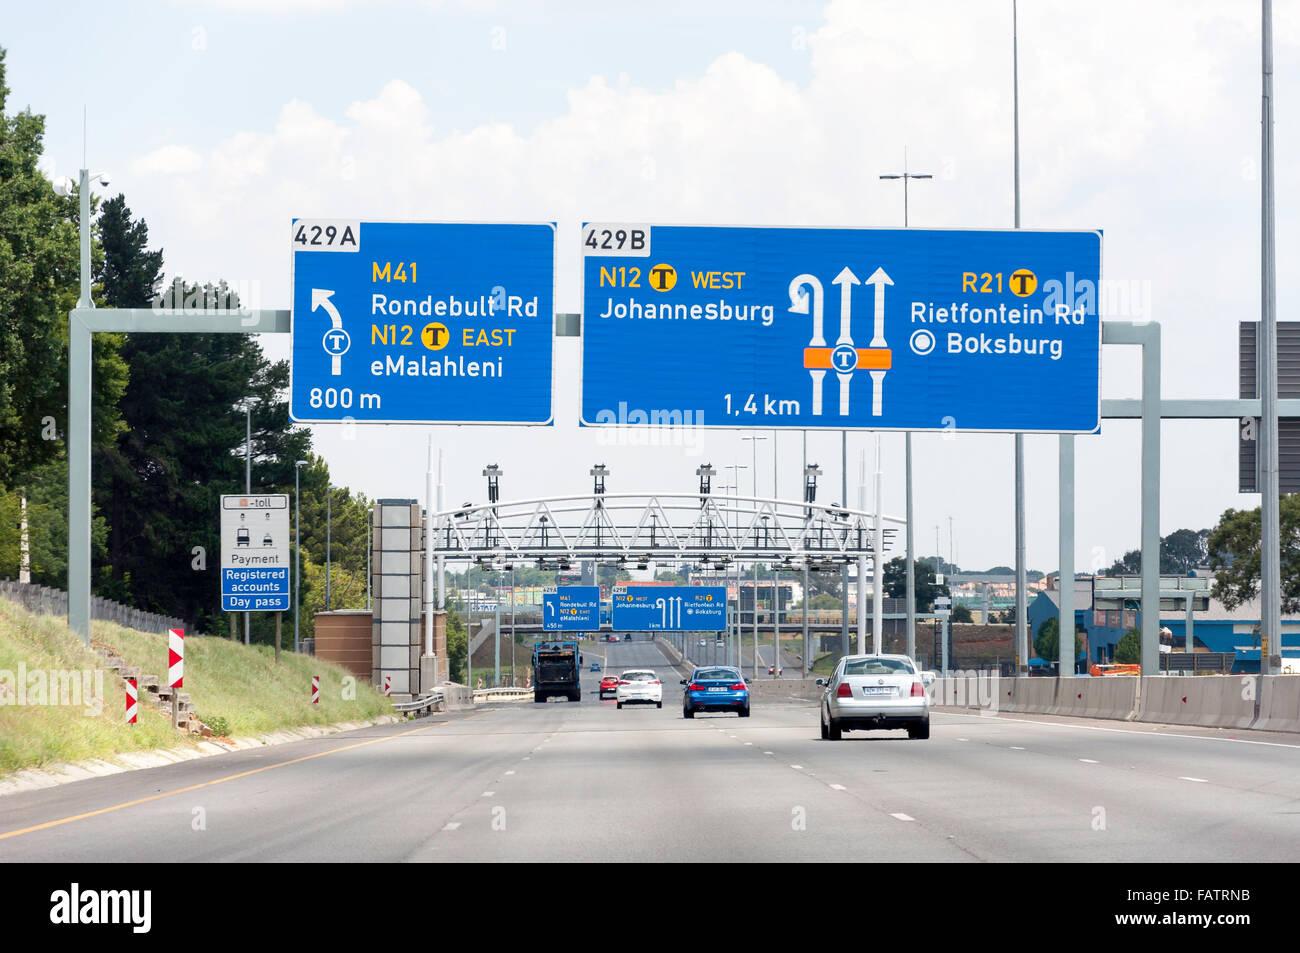 E-toll barrier on M21 Motorway, Kempton Park, Ekurhuleni Metropolitan Municipality, Gauteng Province, Republic of - Stock Image